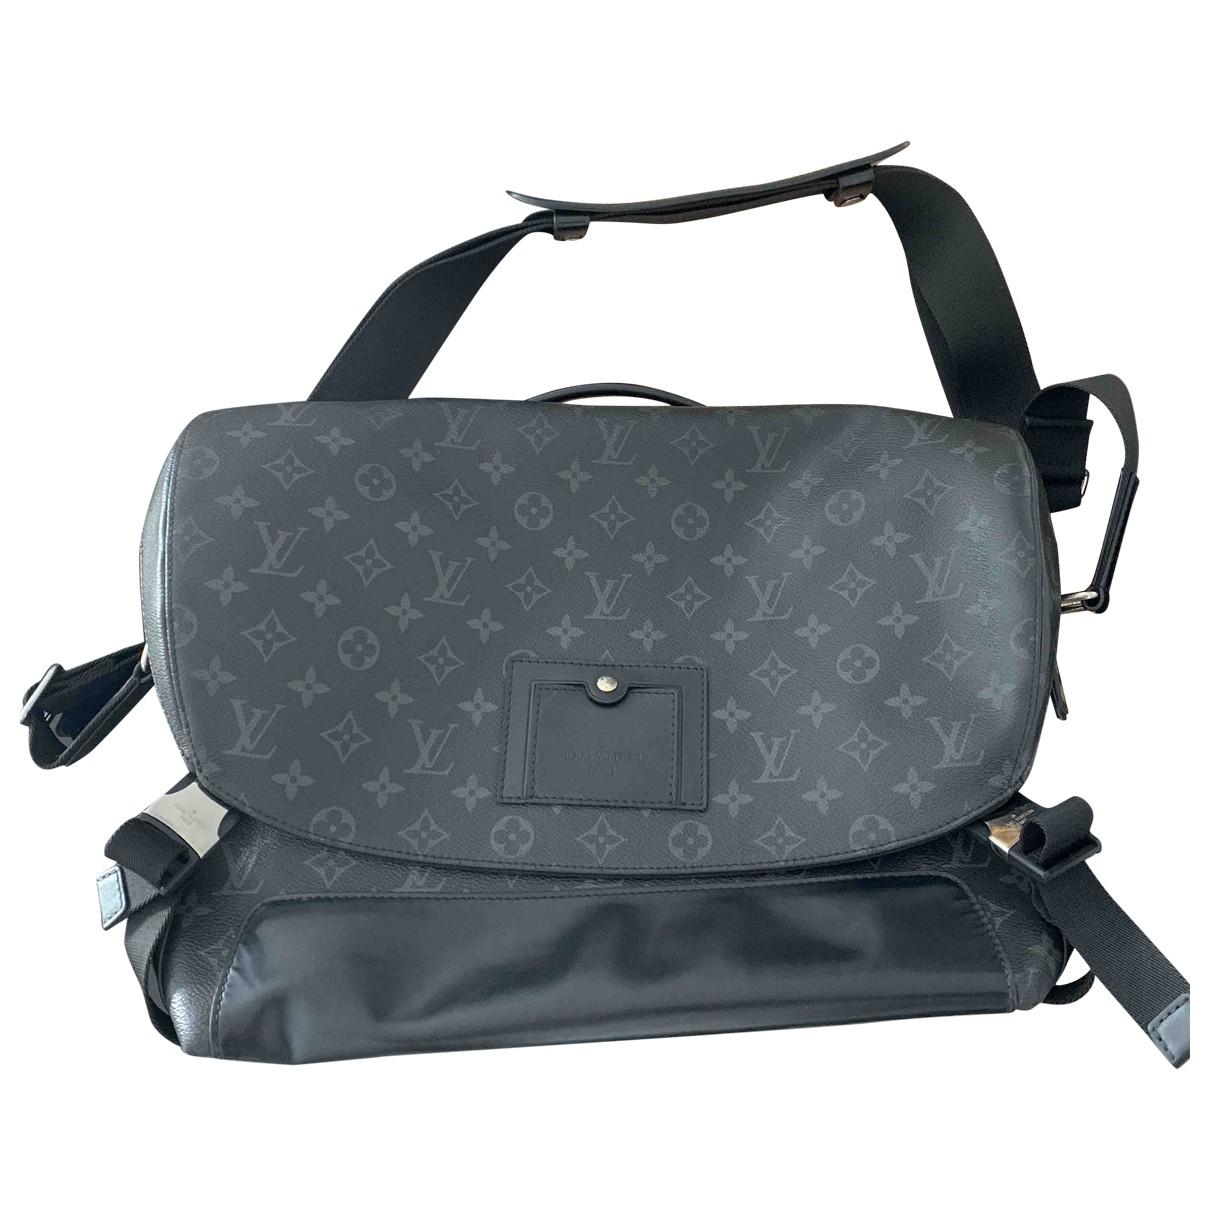 Louis Vuitton Messenger Monogram PM Titanium  Black Cloth bag for Men \N